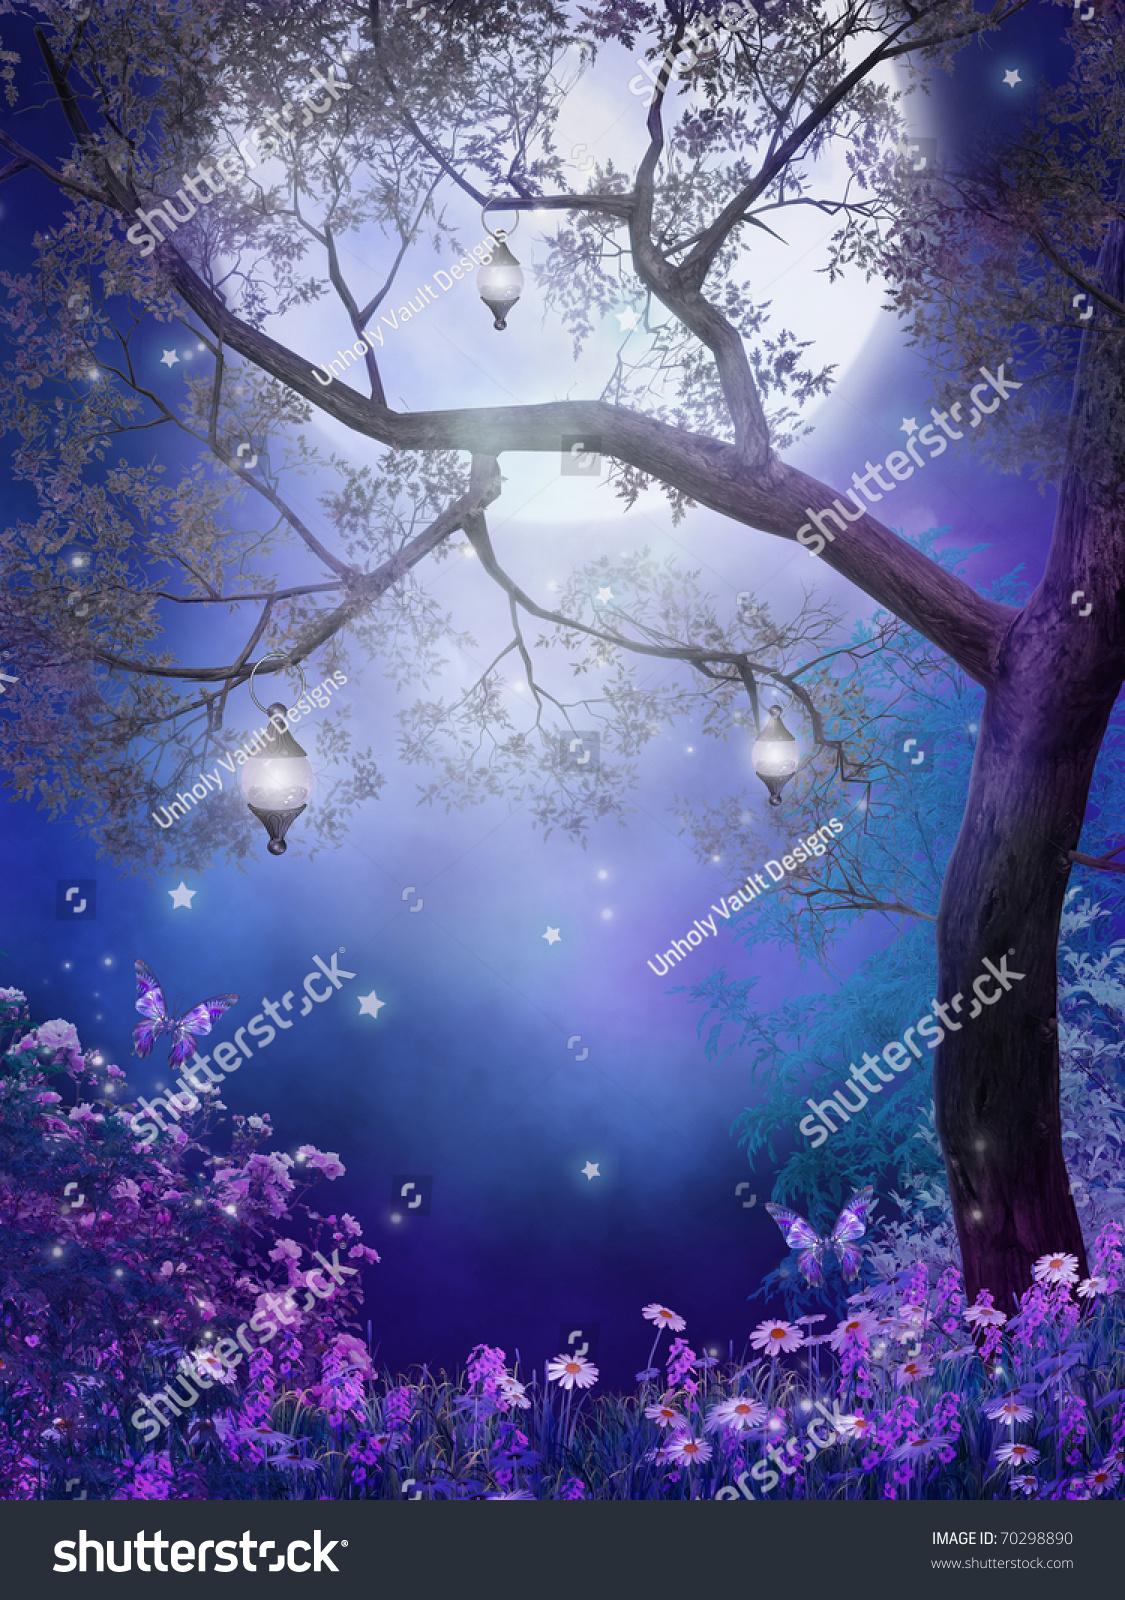 Worksheet Fairy Tree purple meadow fairy tree stock illustration 70298890 shutterstock with a tree